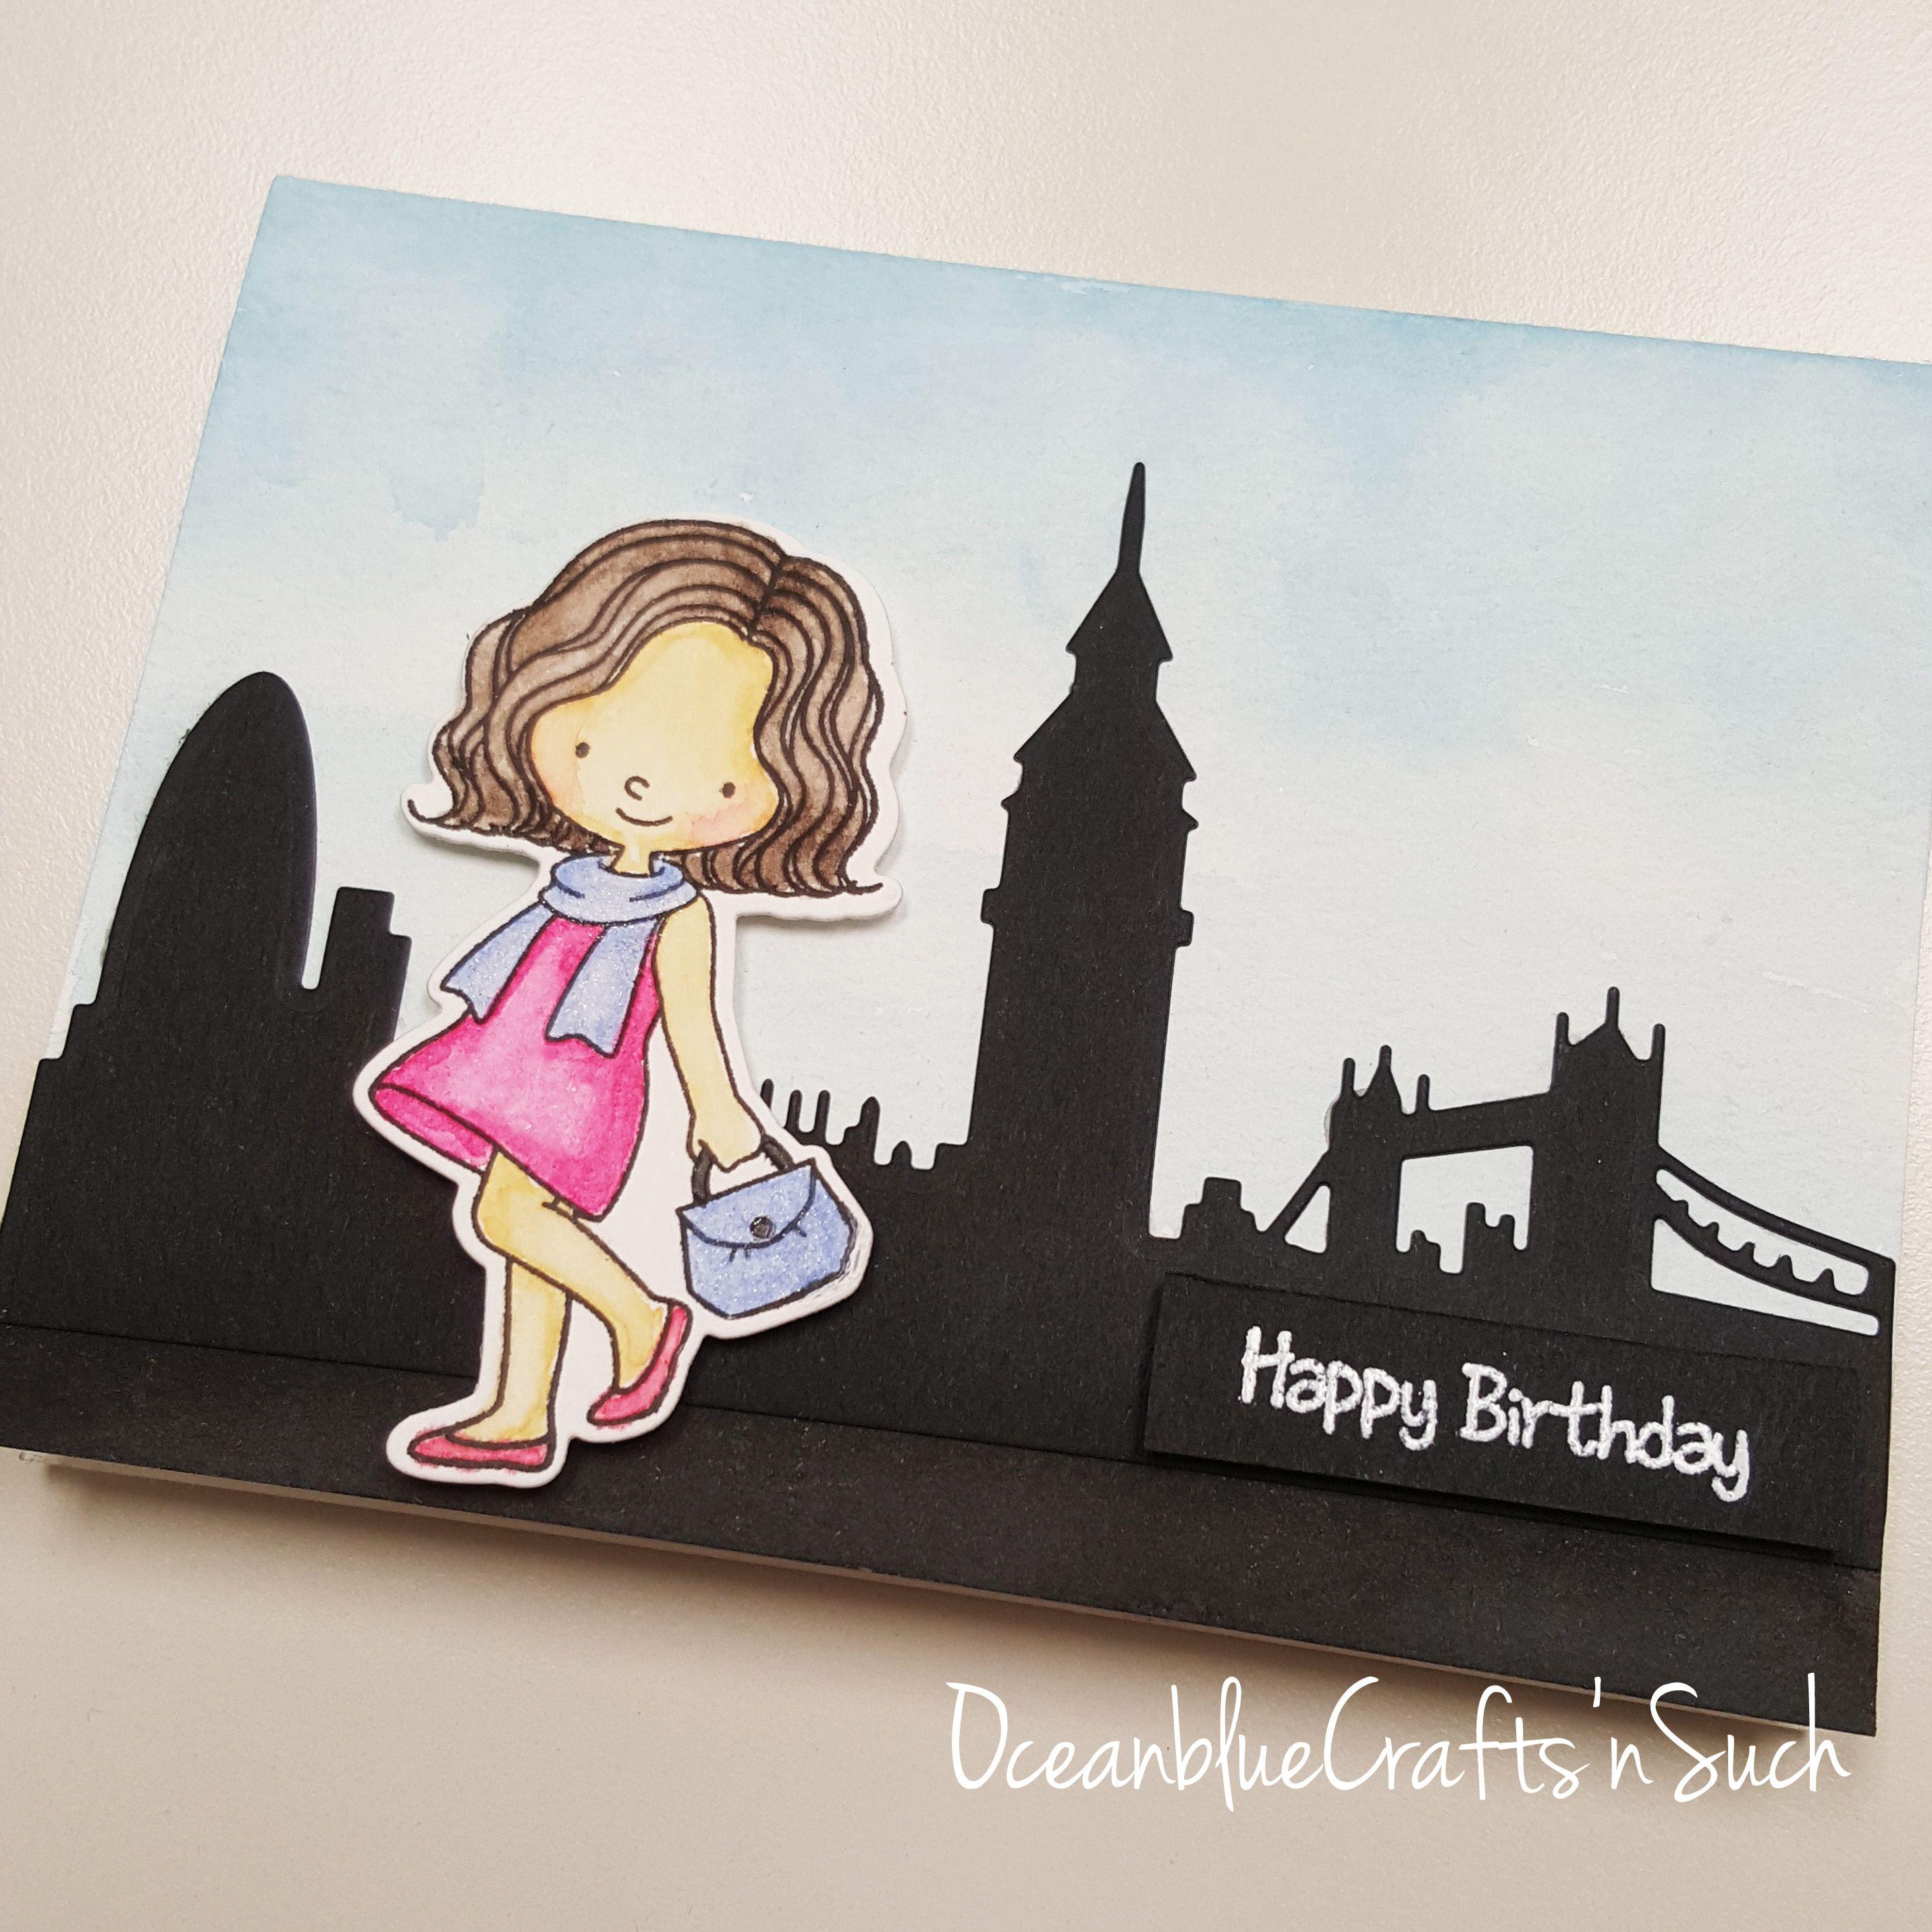 Birthday Card Featuring Mft Mon Cheri Stamp Set Cool Birthday Cards Birthday Cards For Mom Birthday Cards